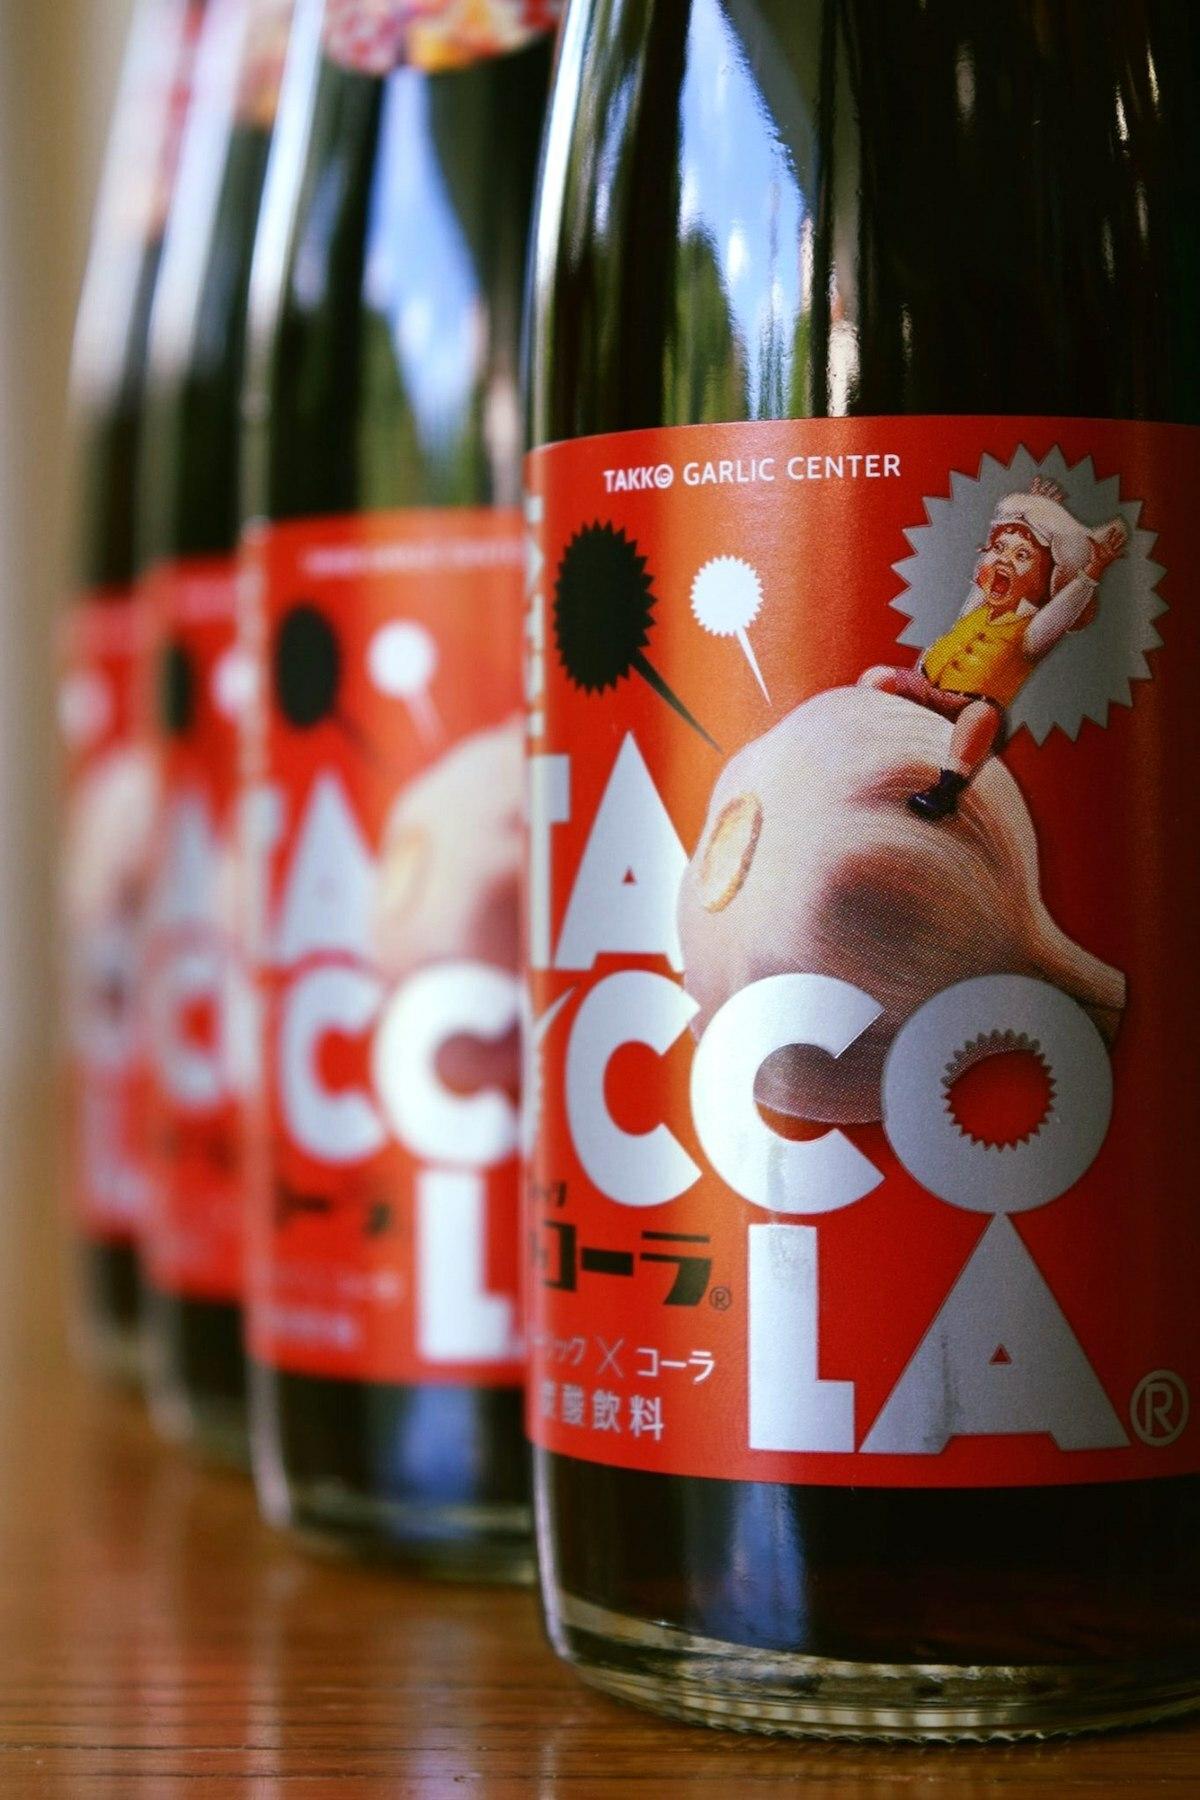 Tacco Cola - Boisson cola Ail ©VisitHachinohe